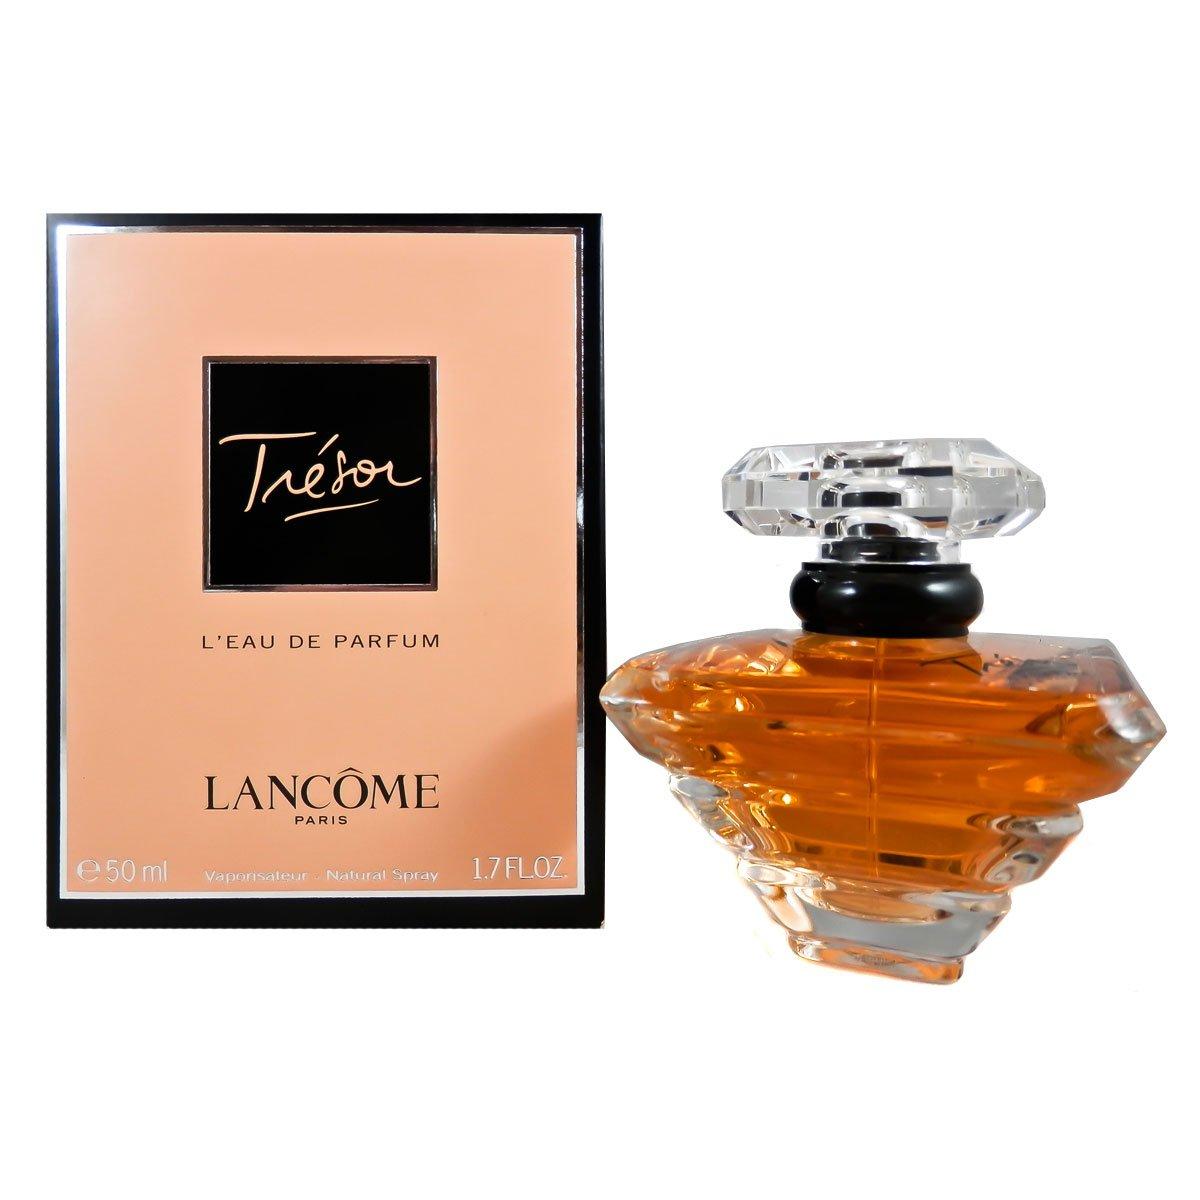 Lancome - Tresor - Eau de Parfum para mujer - 50 ml product image